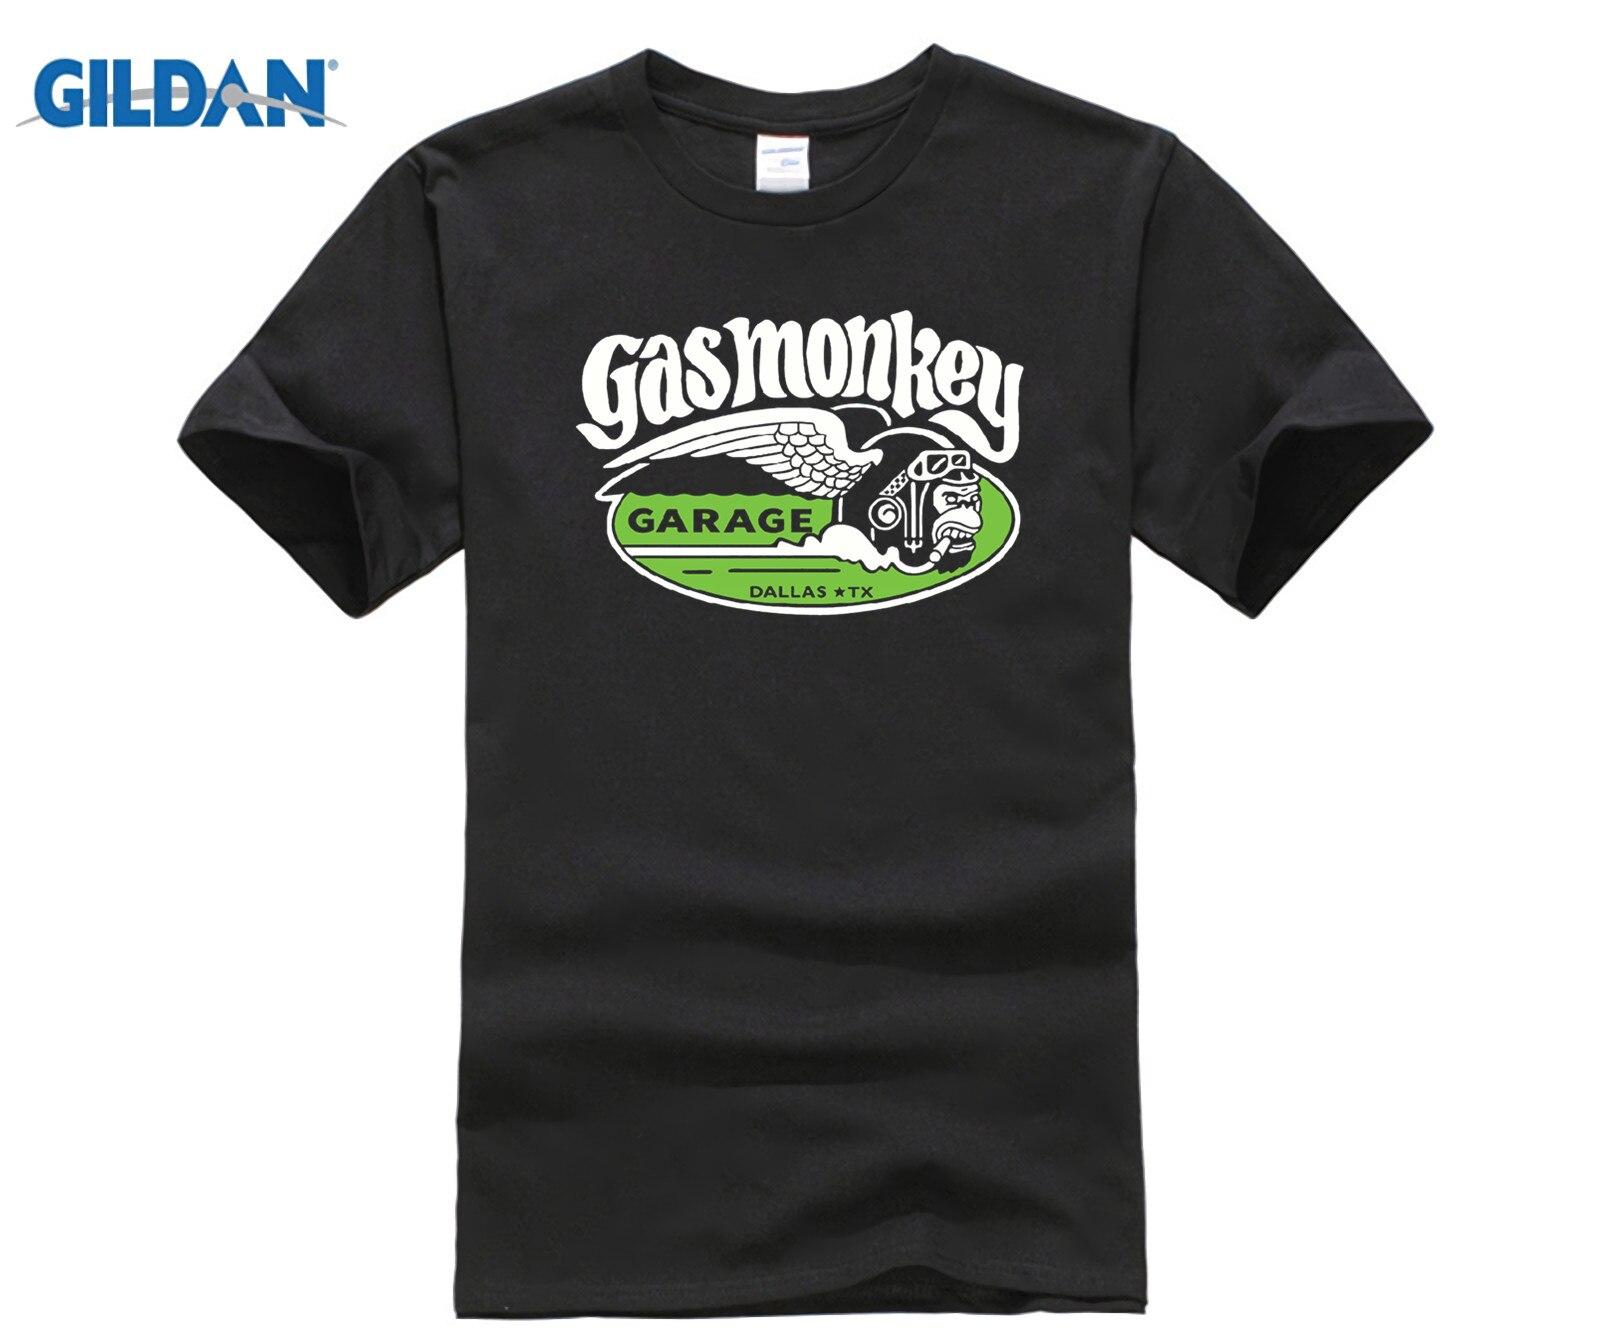 Camiseta blanca negra para hombre, talla S-3XL, Camiseta de algodón para hombre camiseta de manga corta